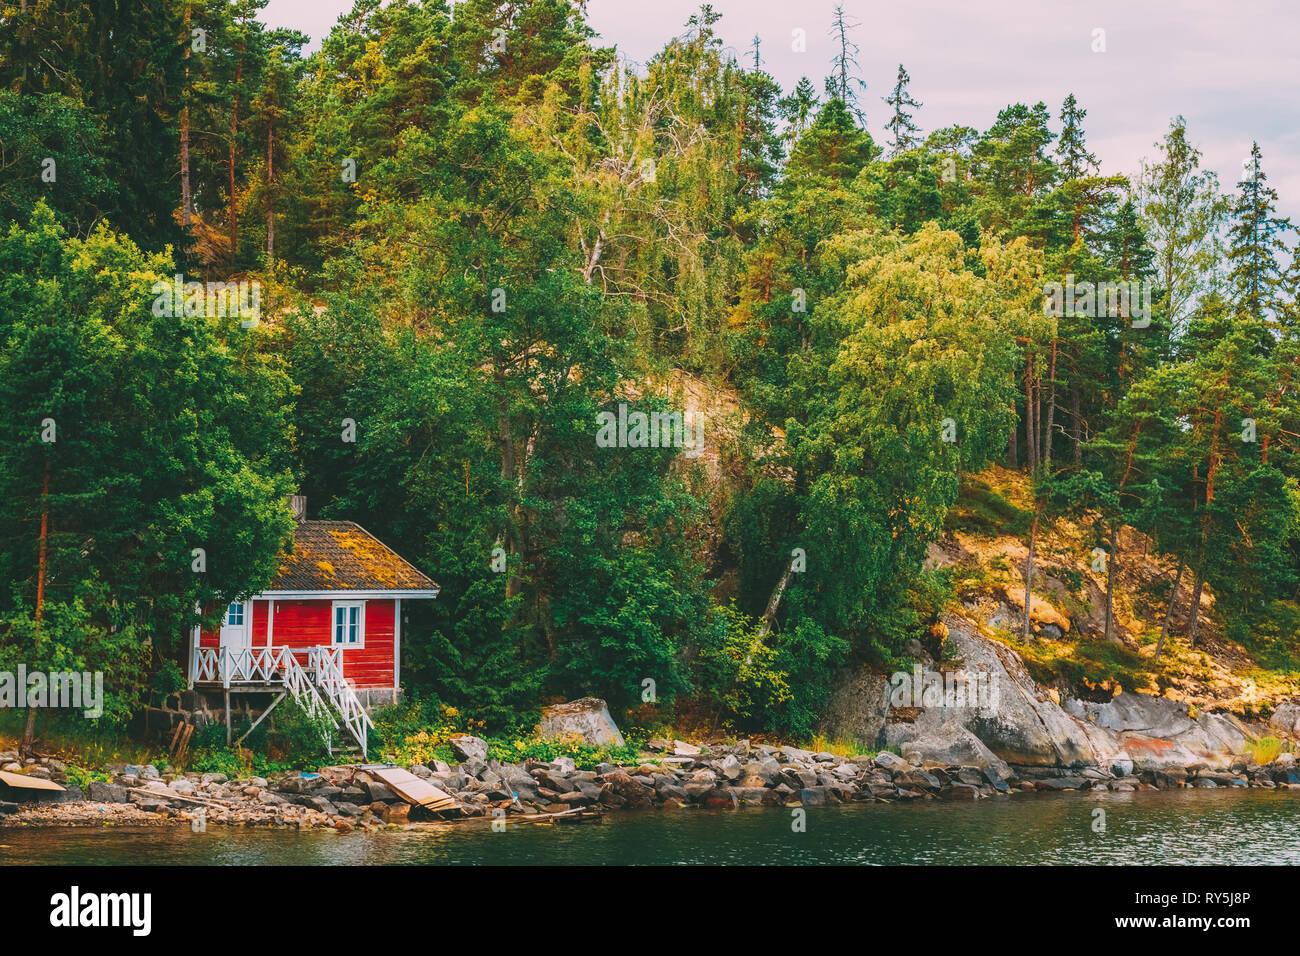 Red Finnish Wooden Bath Sauna Log Cabin On Island In Summer - Stock Image